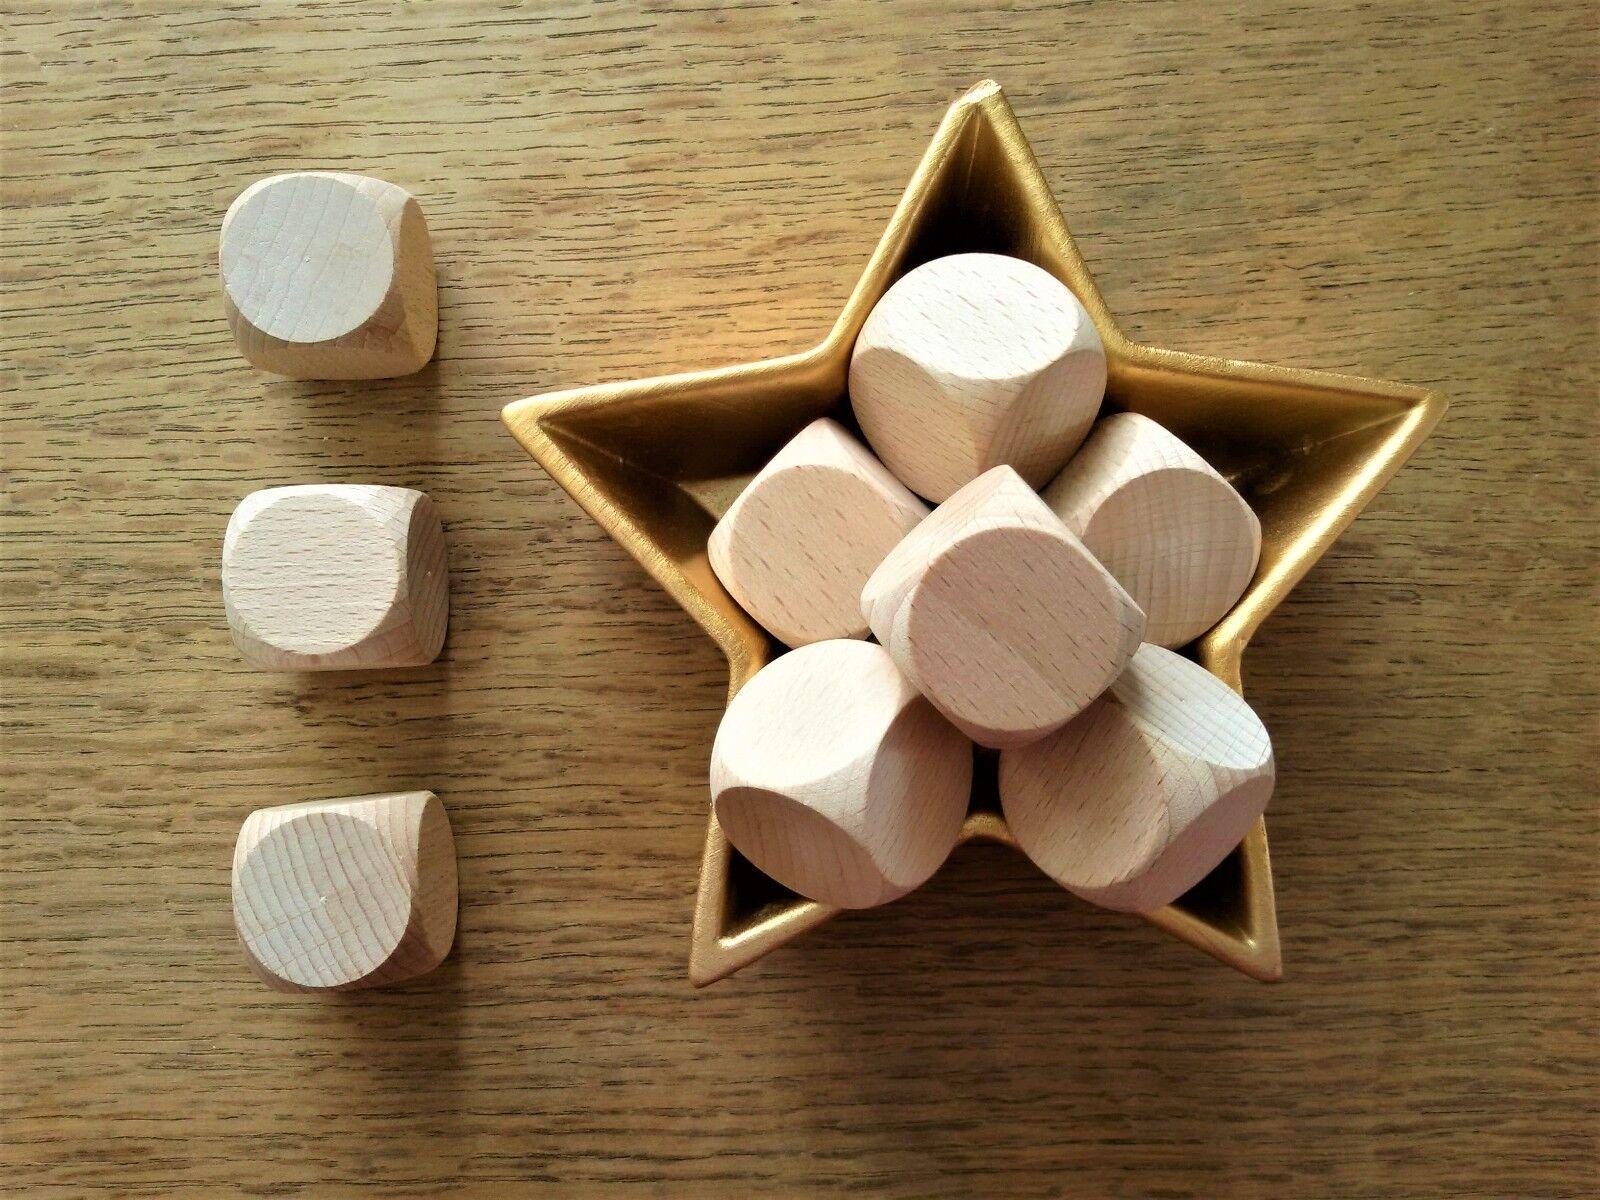 Wooden Dice Blank Plain Unpainted 30 mm High Quality Beech